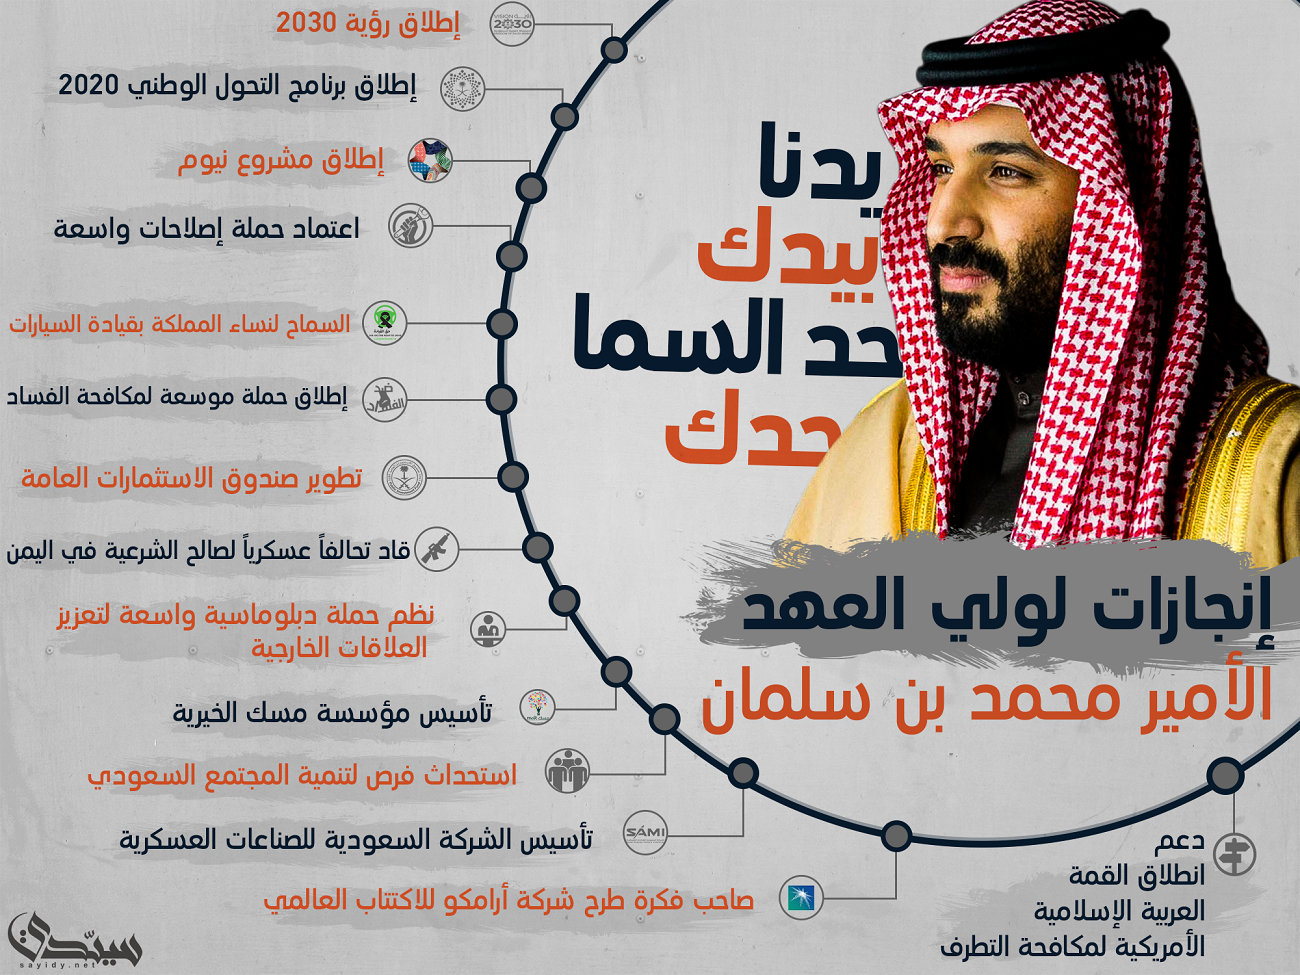 انجازات الملك سلمان Hd Youtube